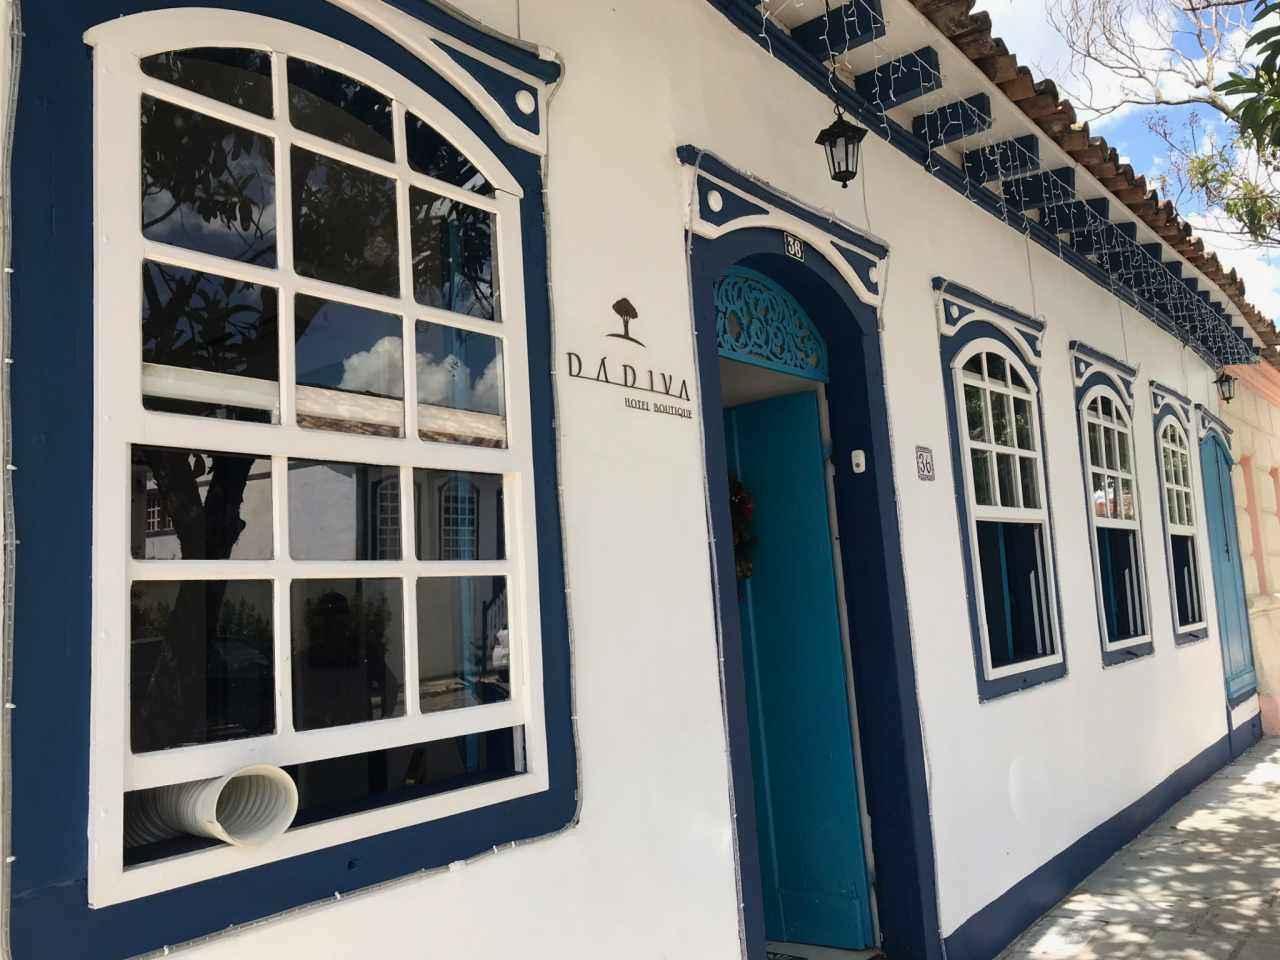 Dádiva Hotel Boutique - Pirenópolis